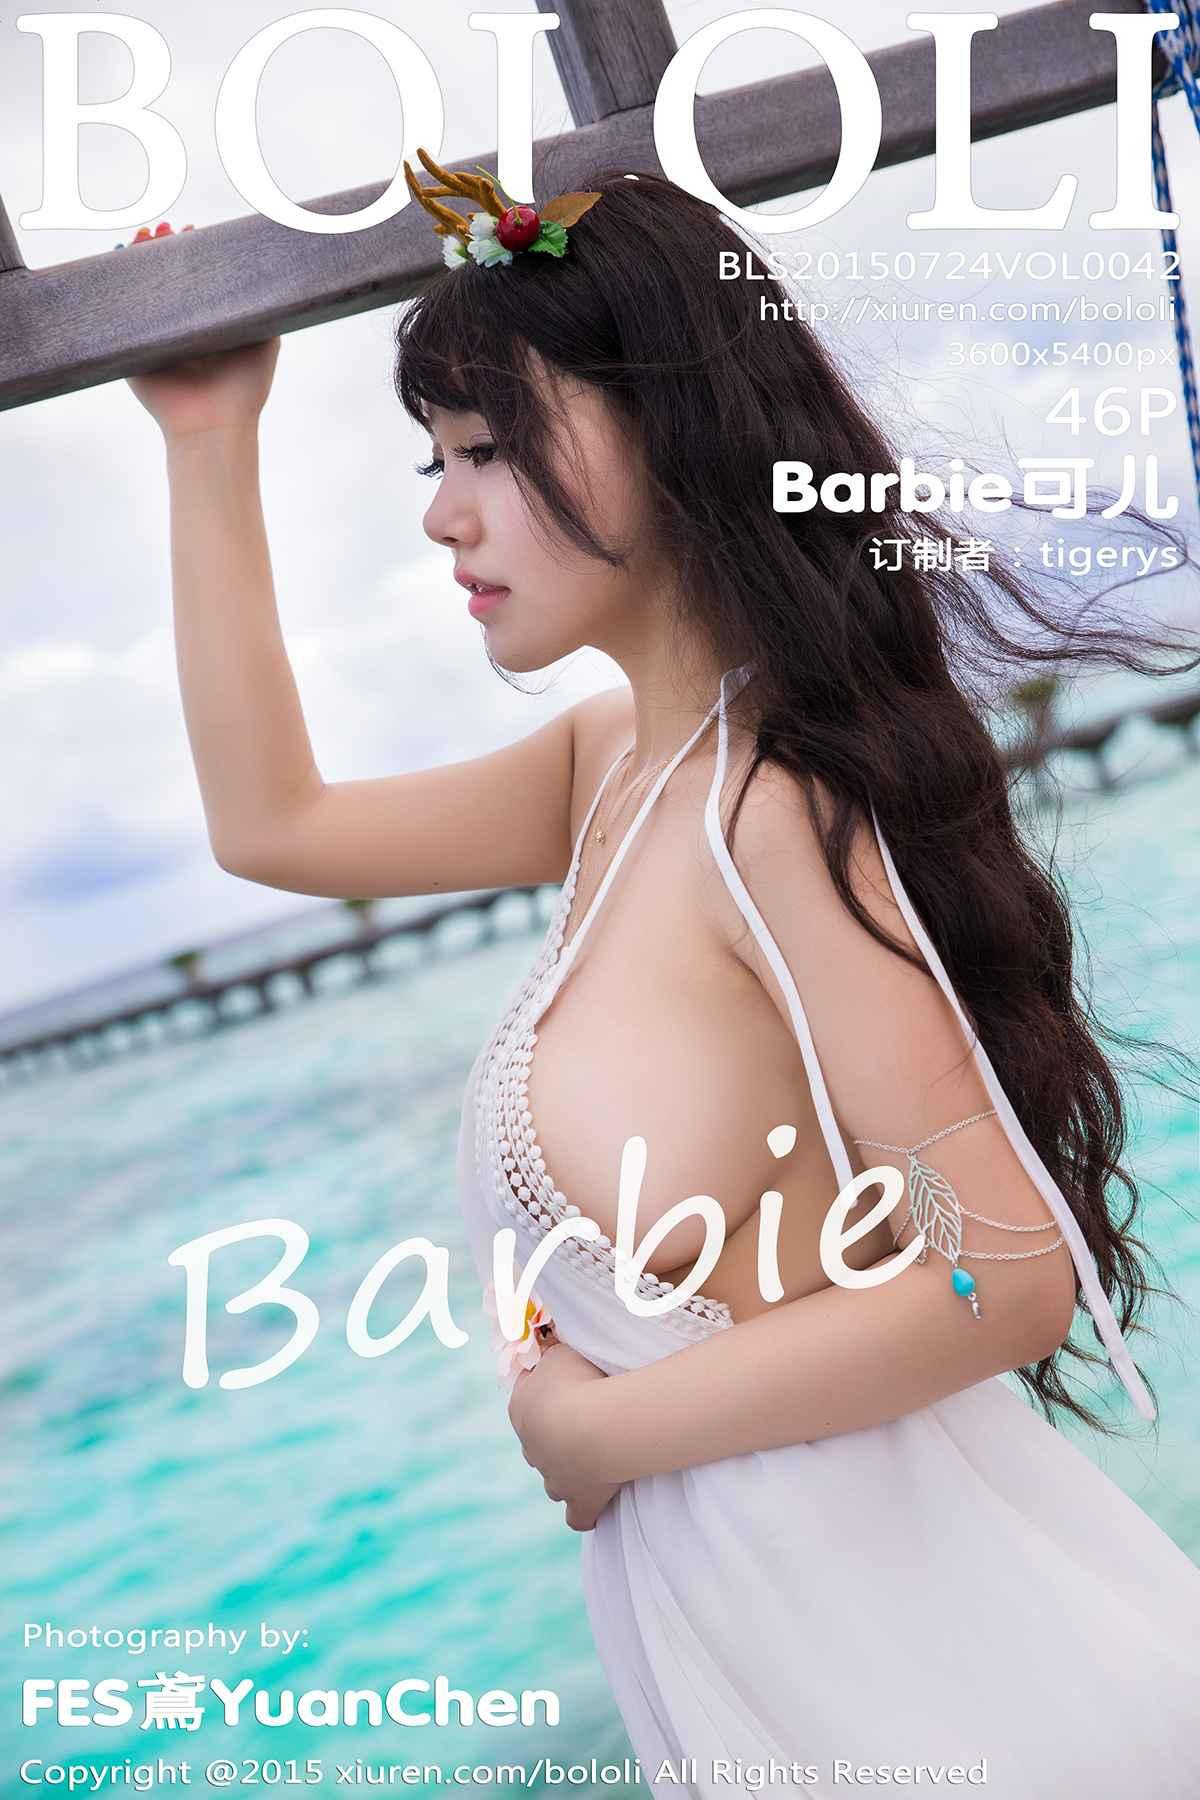 bololi-042-cover.jpg